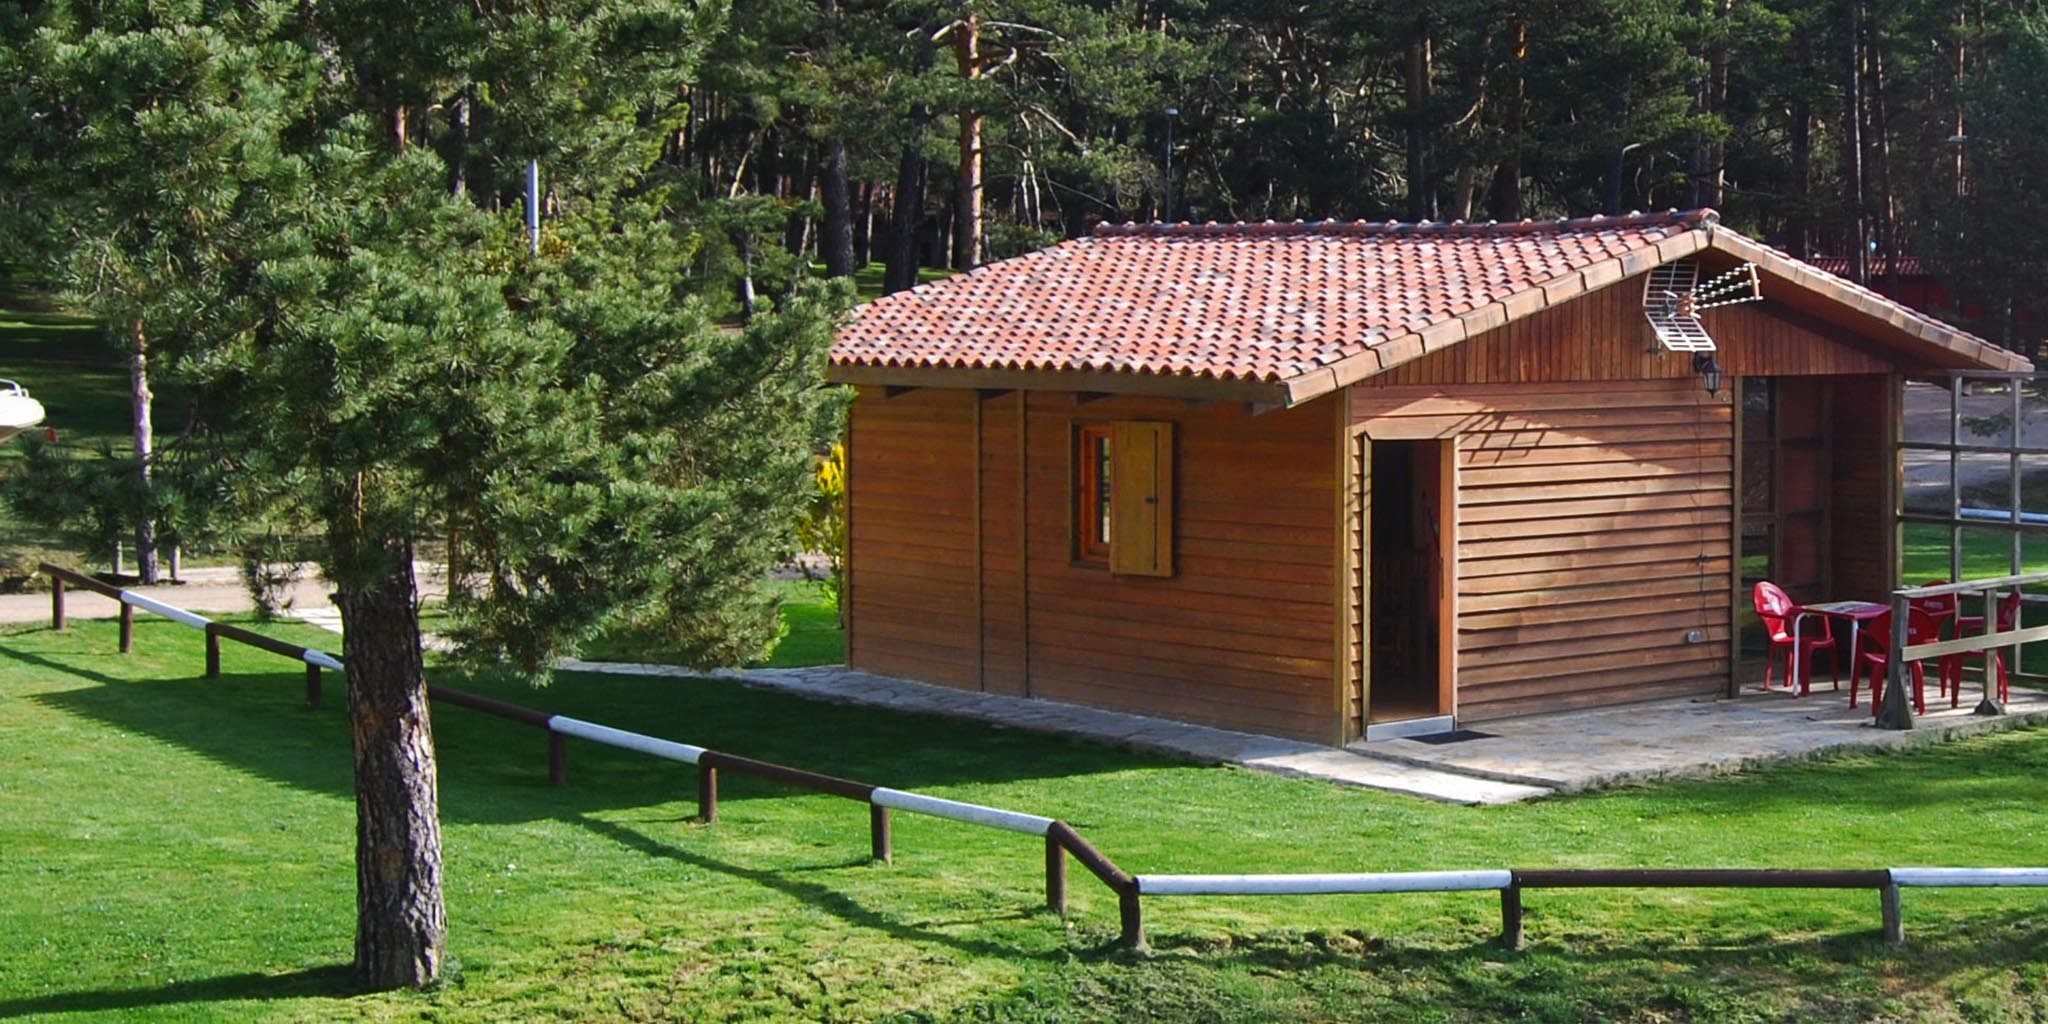 bungalow-buenavista-camping-urbion-soria